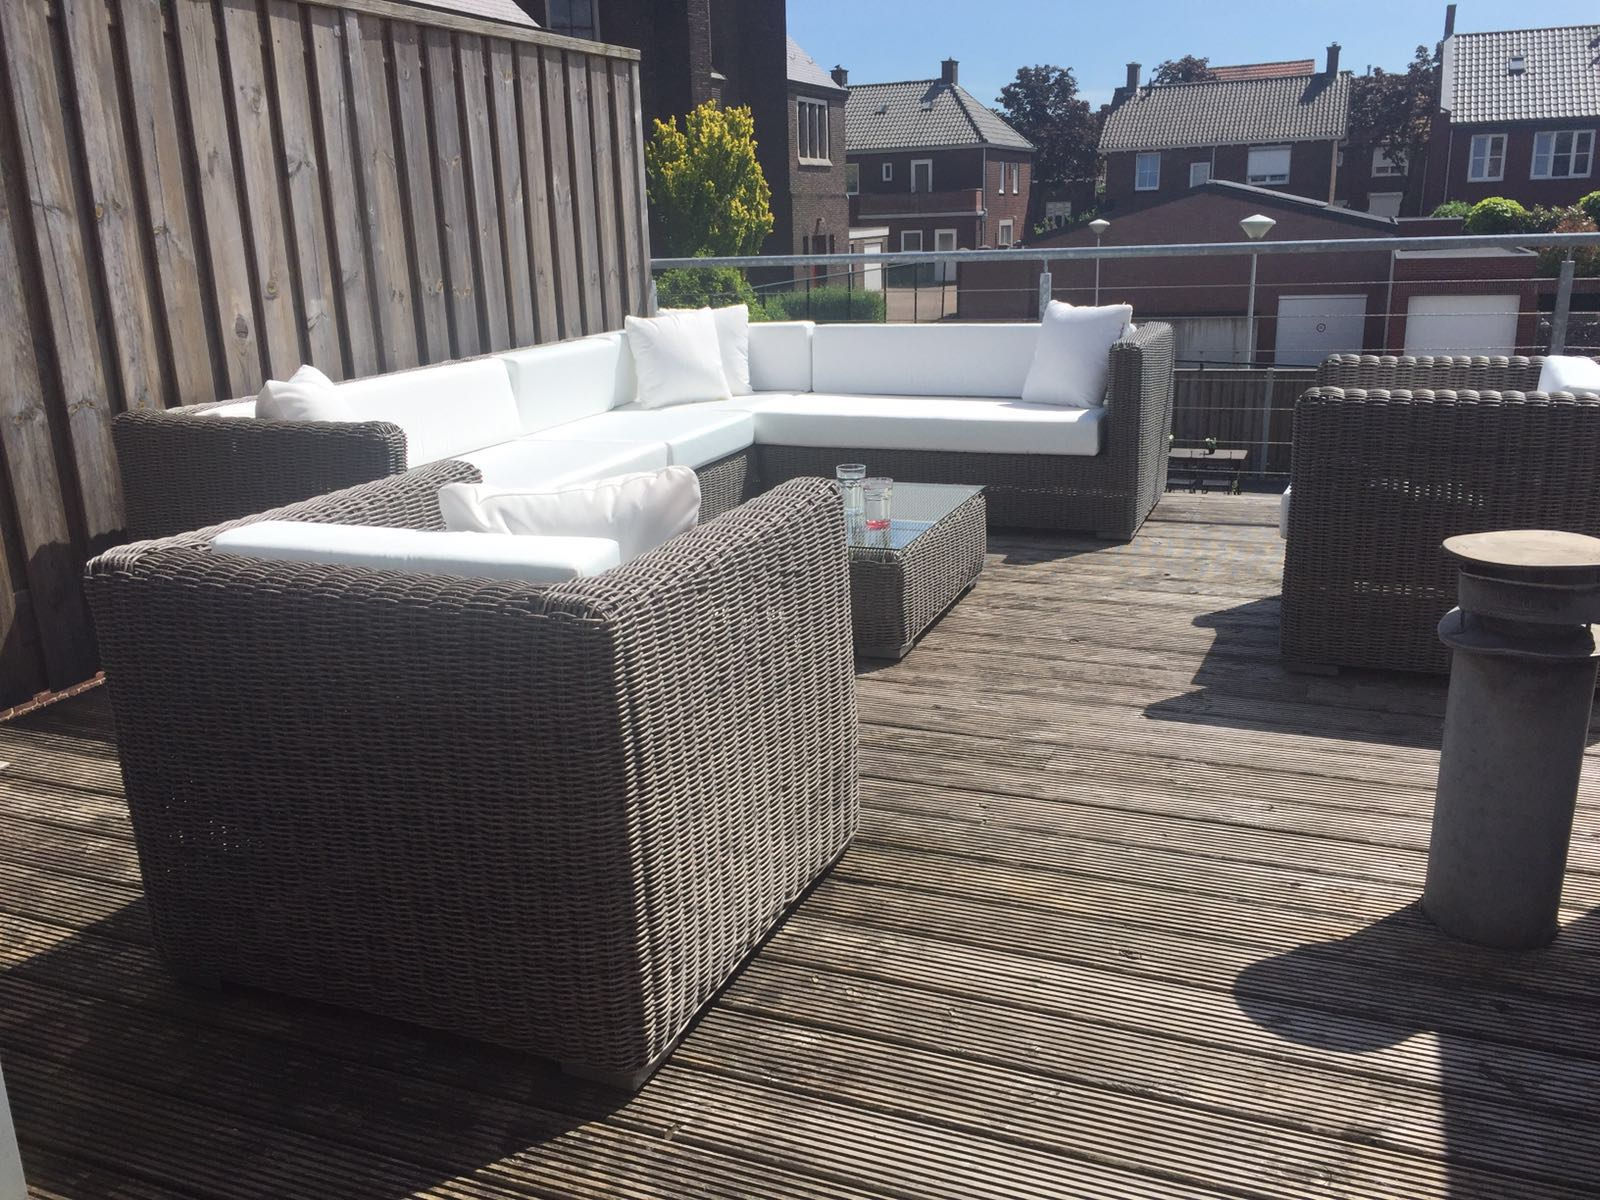 Arbrini design tuinmeubelen juni 2016 - Lounge design grijs ...